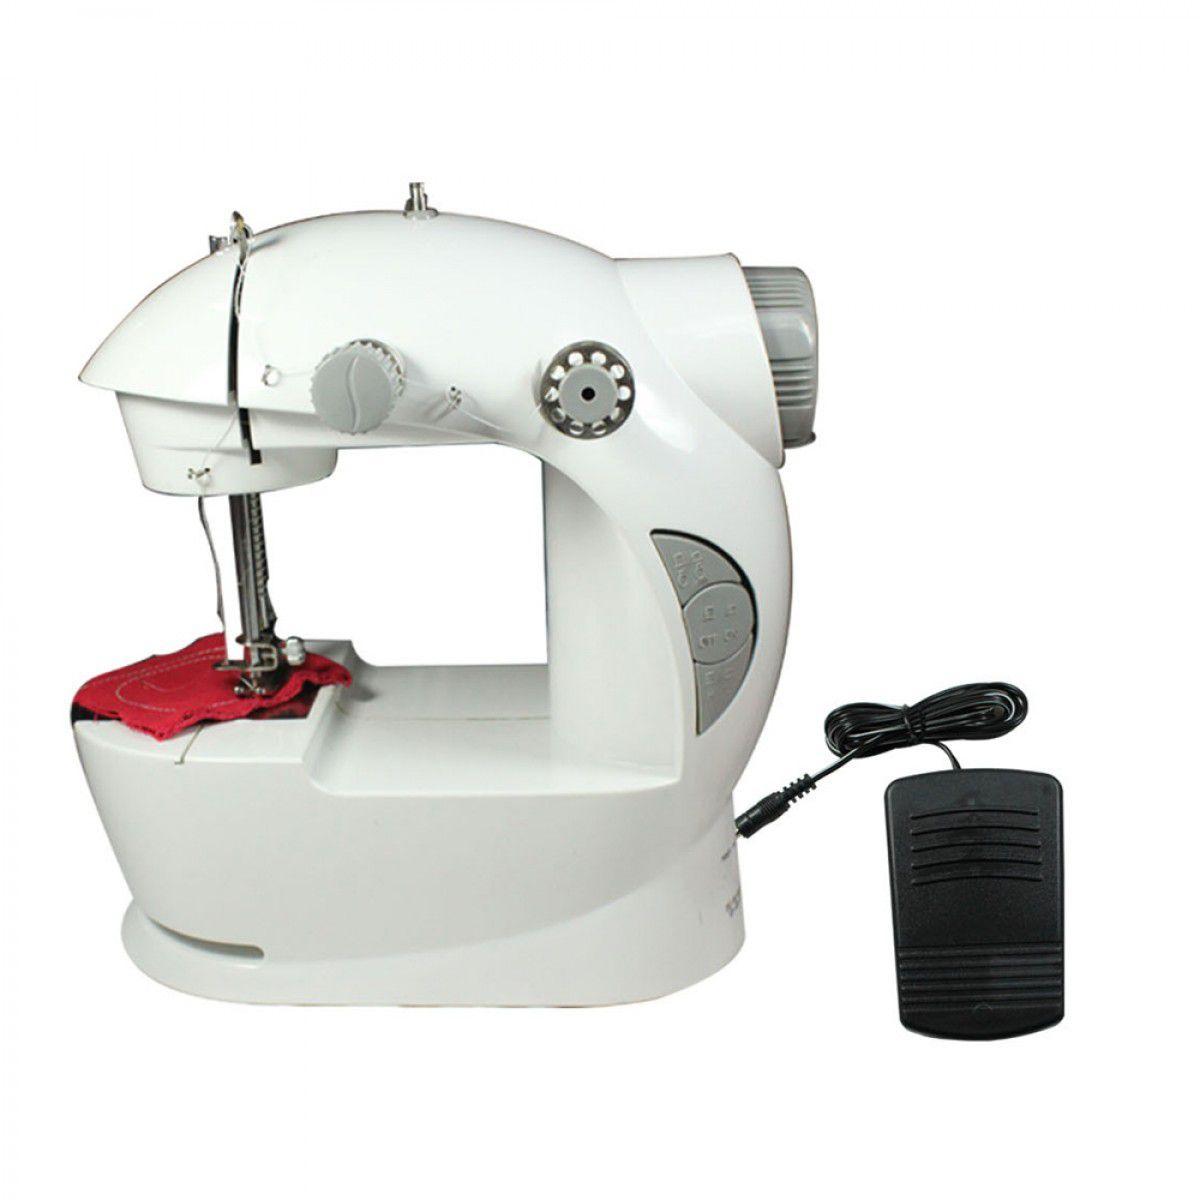 Skycandle MINI-SM Electric Sewing Machine